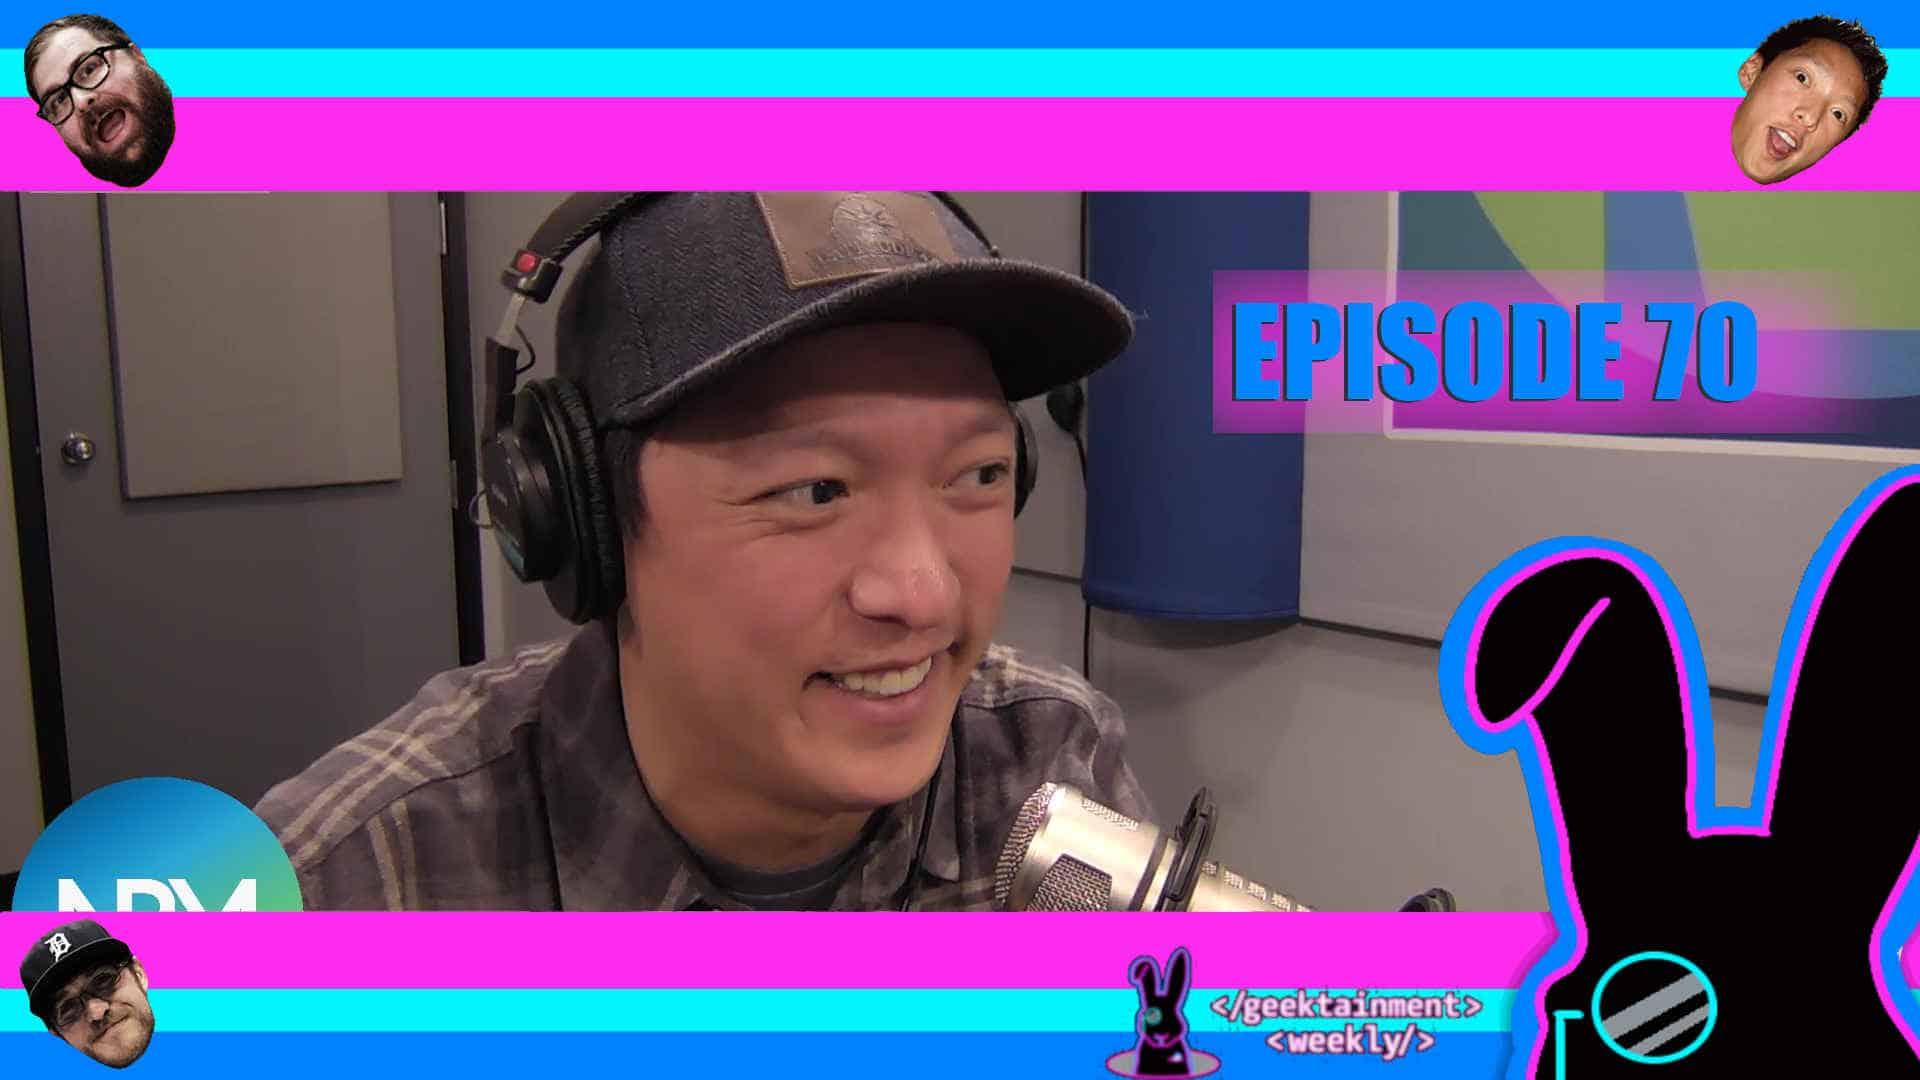 Geektainment Weekly - Episode 70